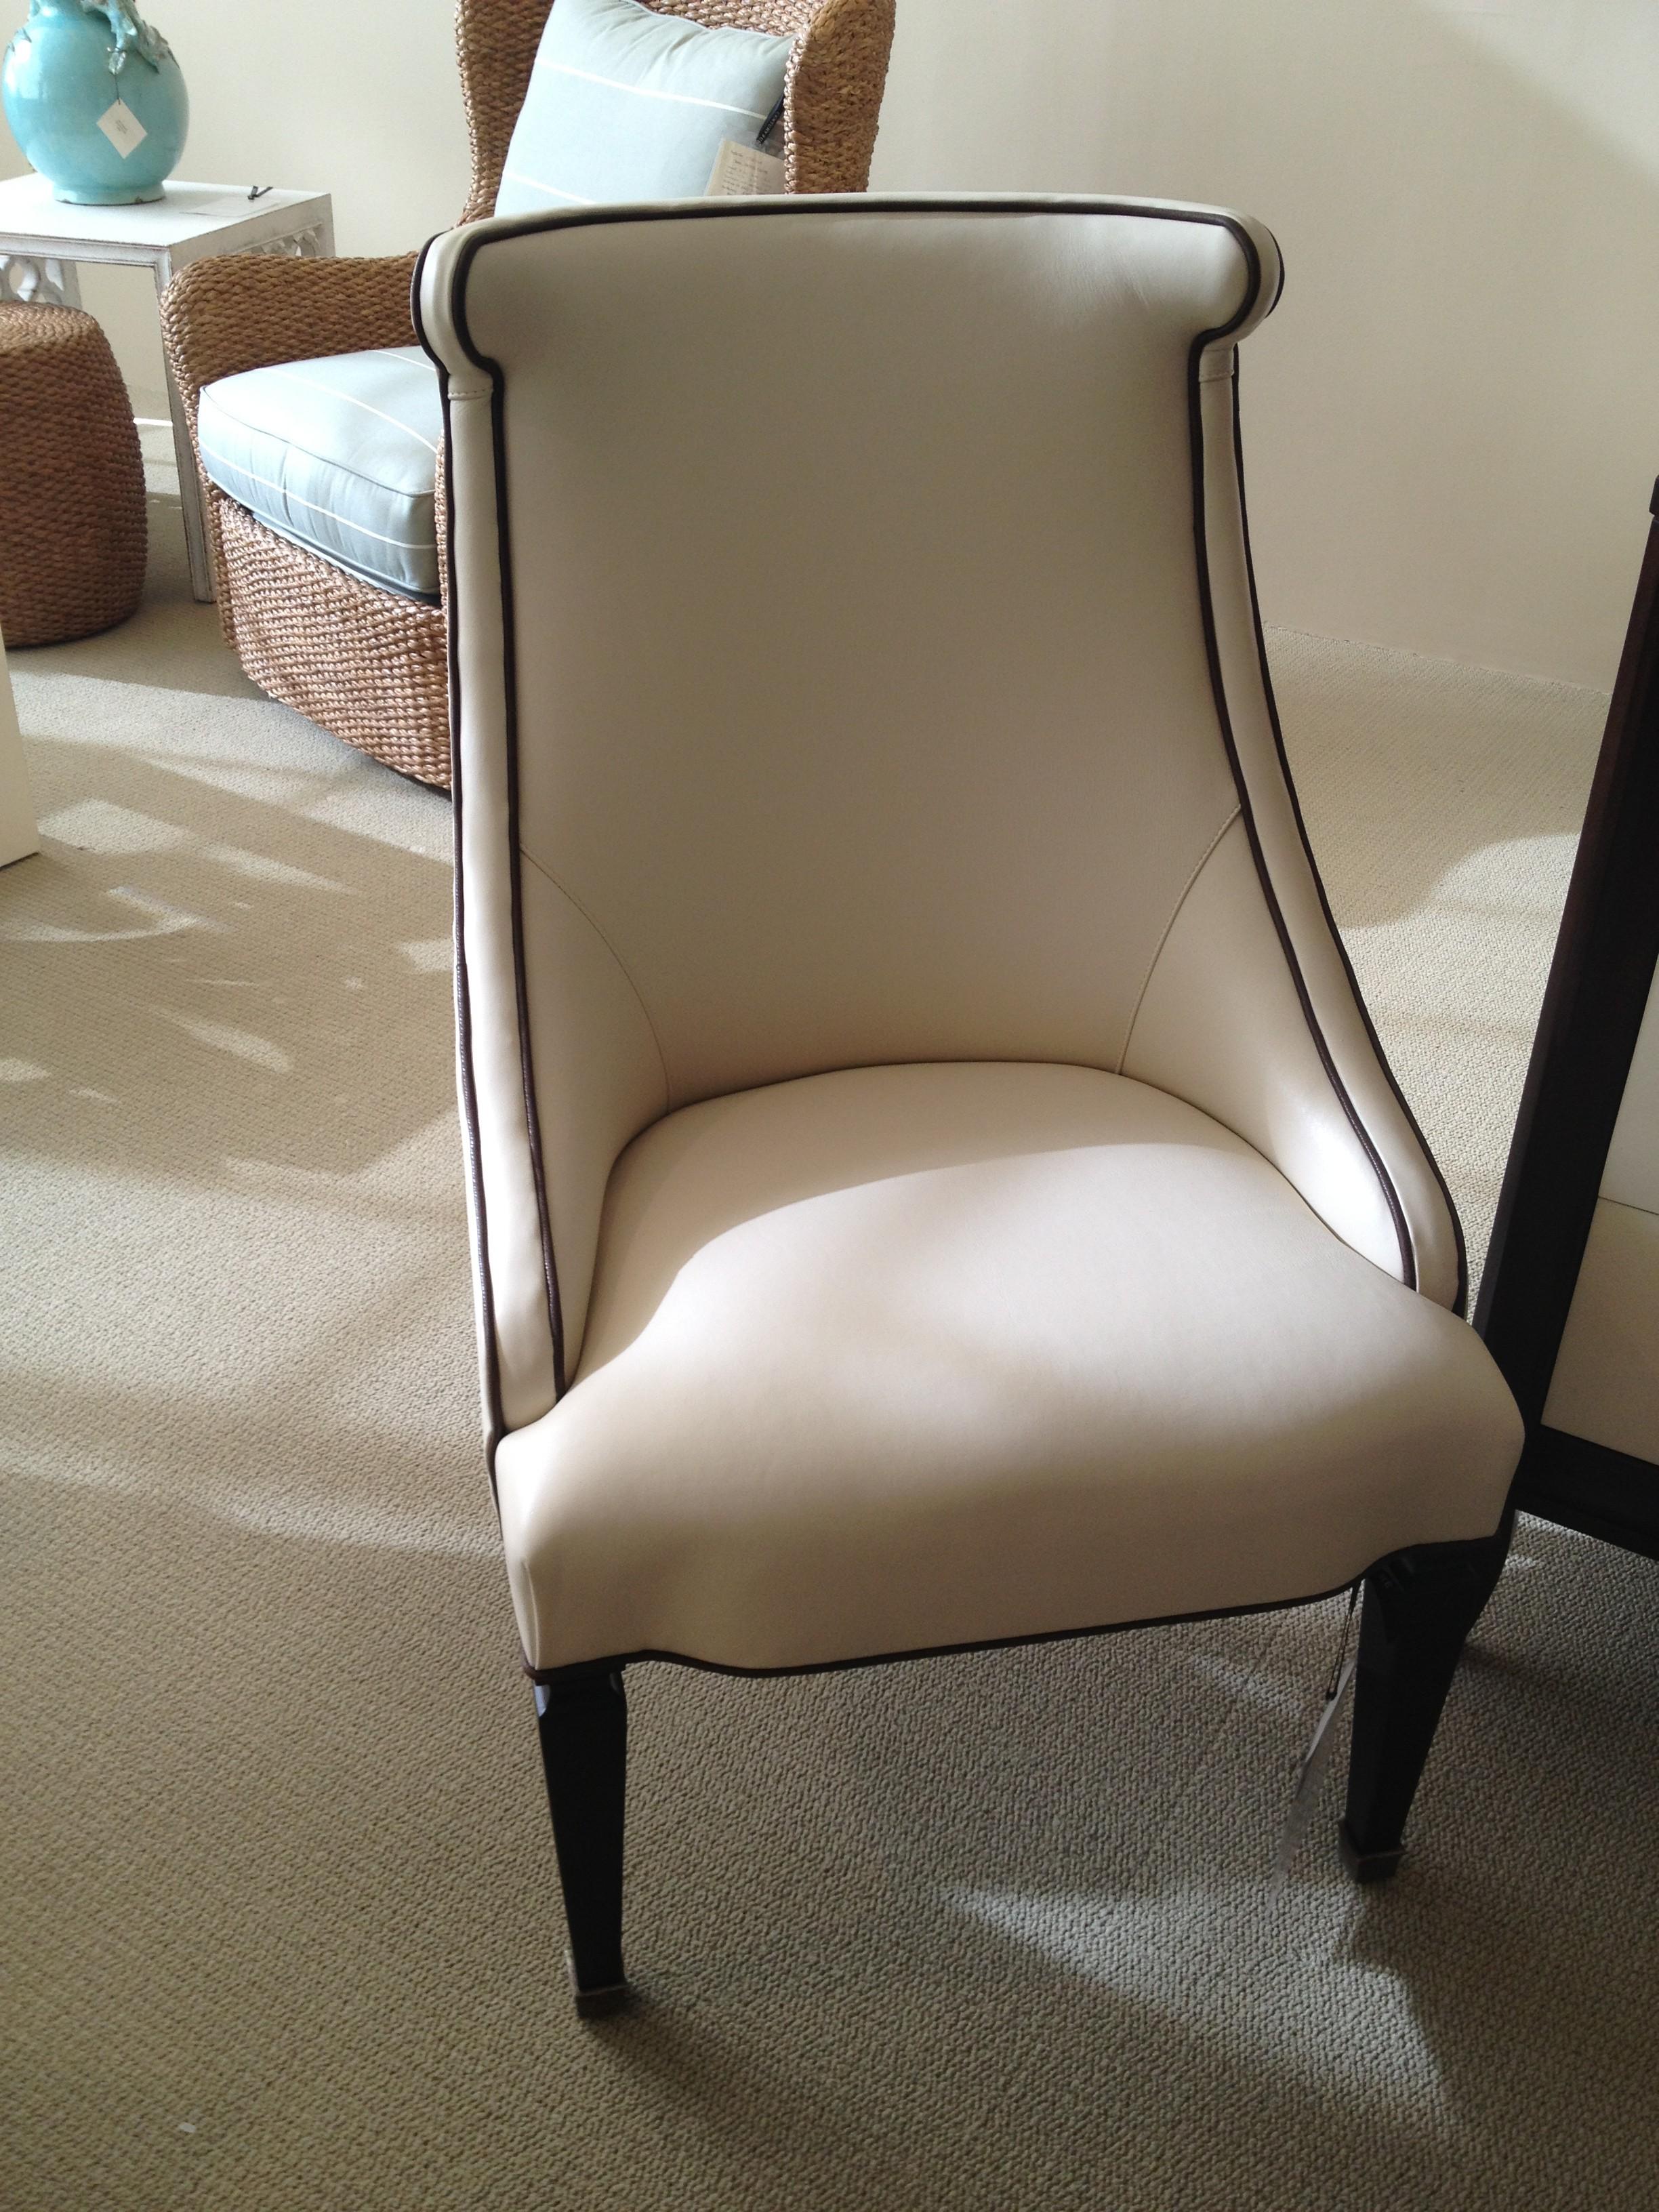 Leather Trim Chair 2